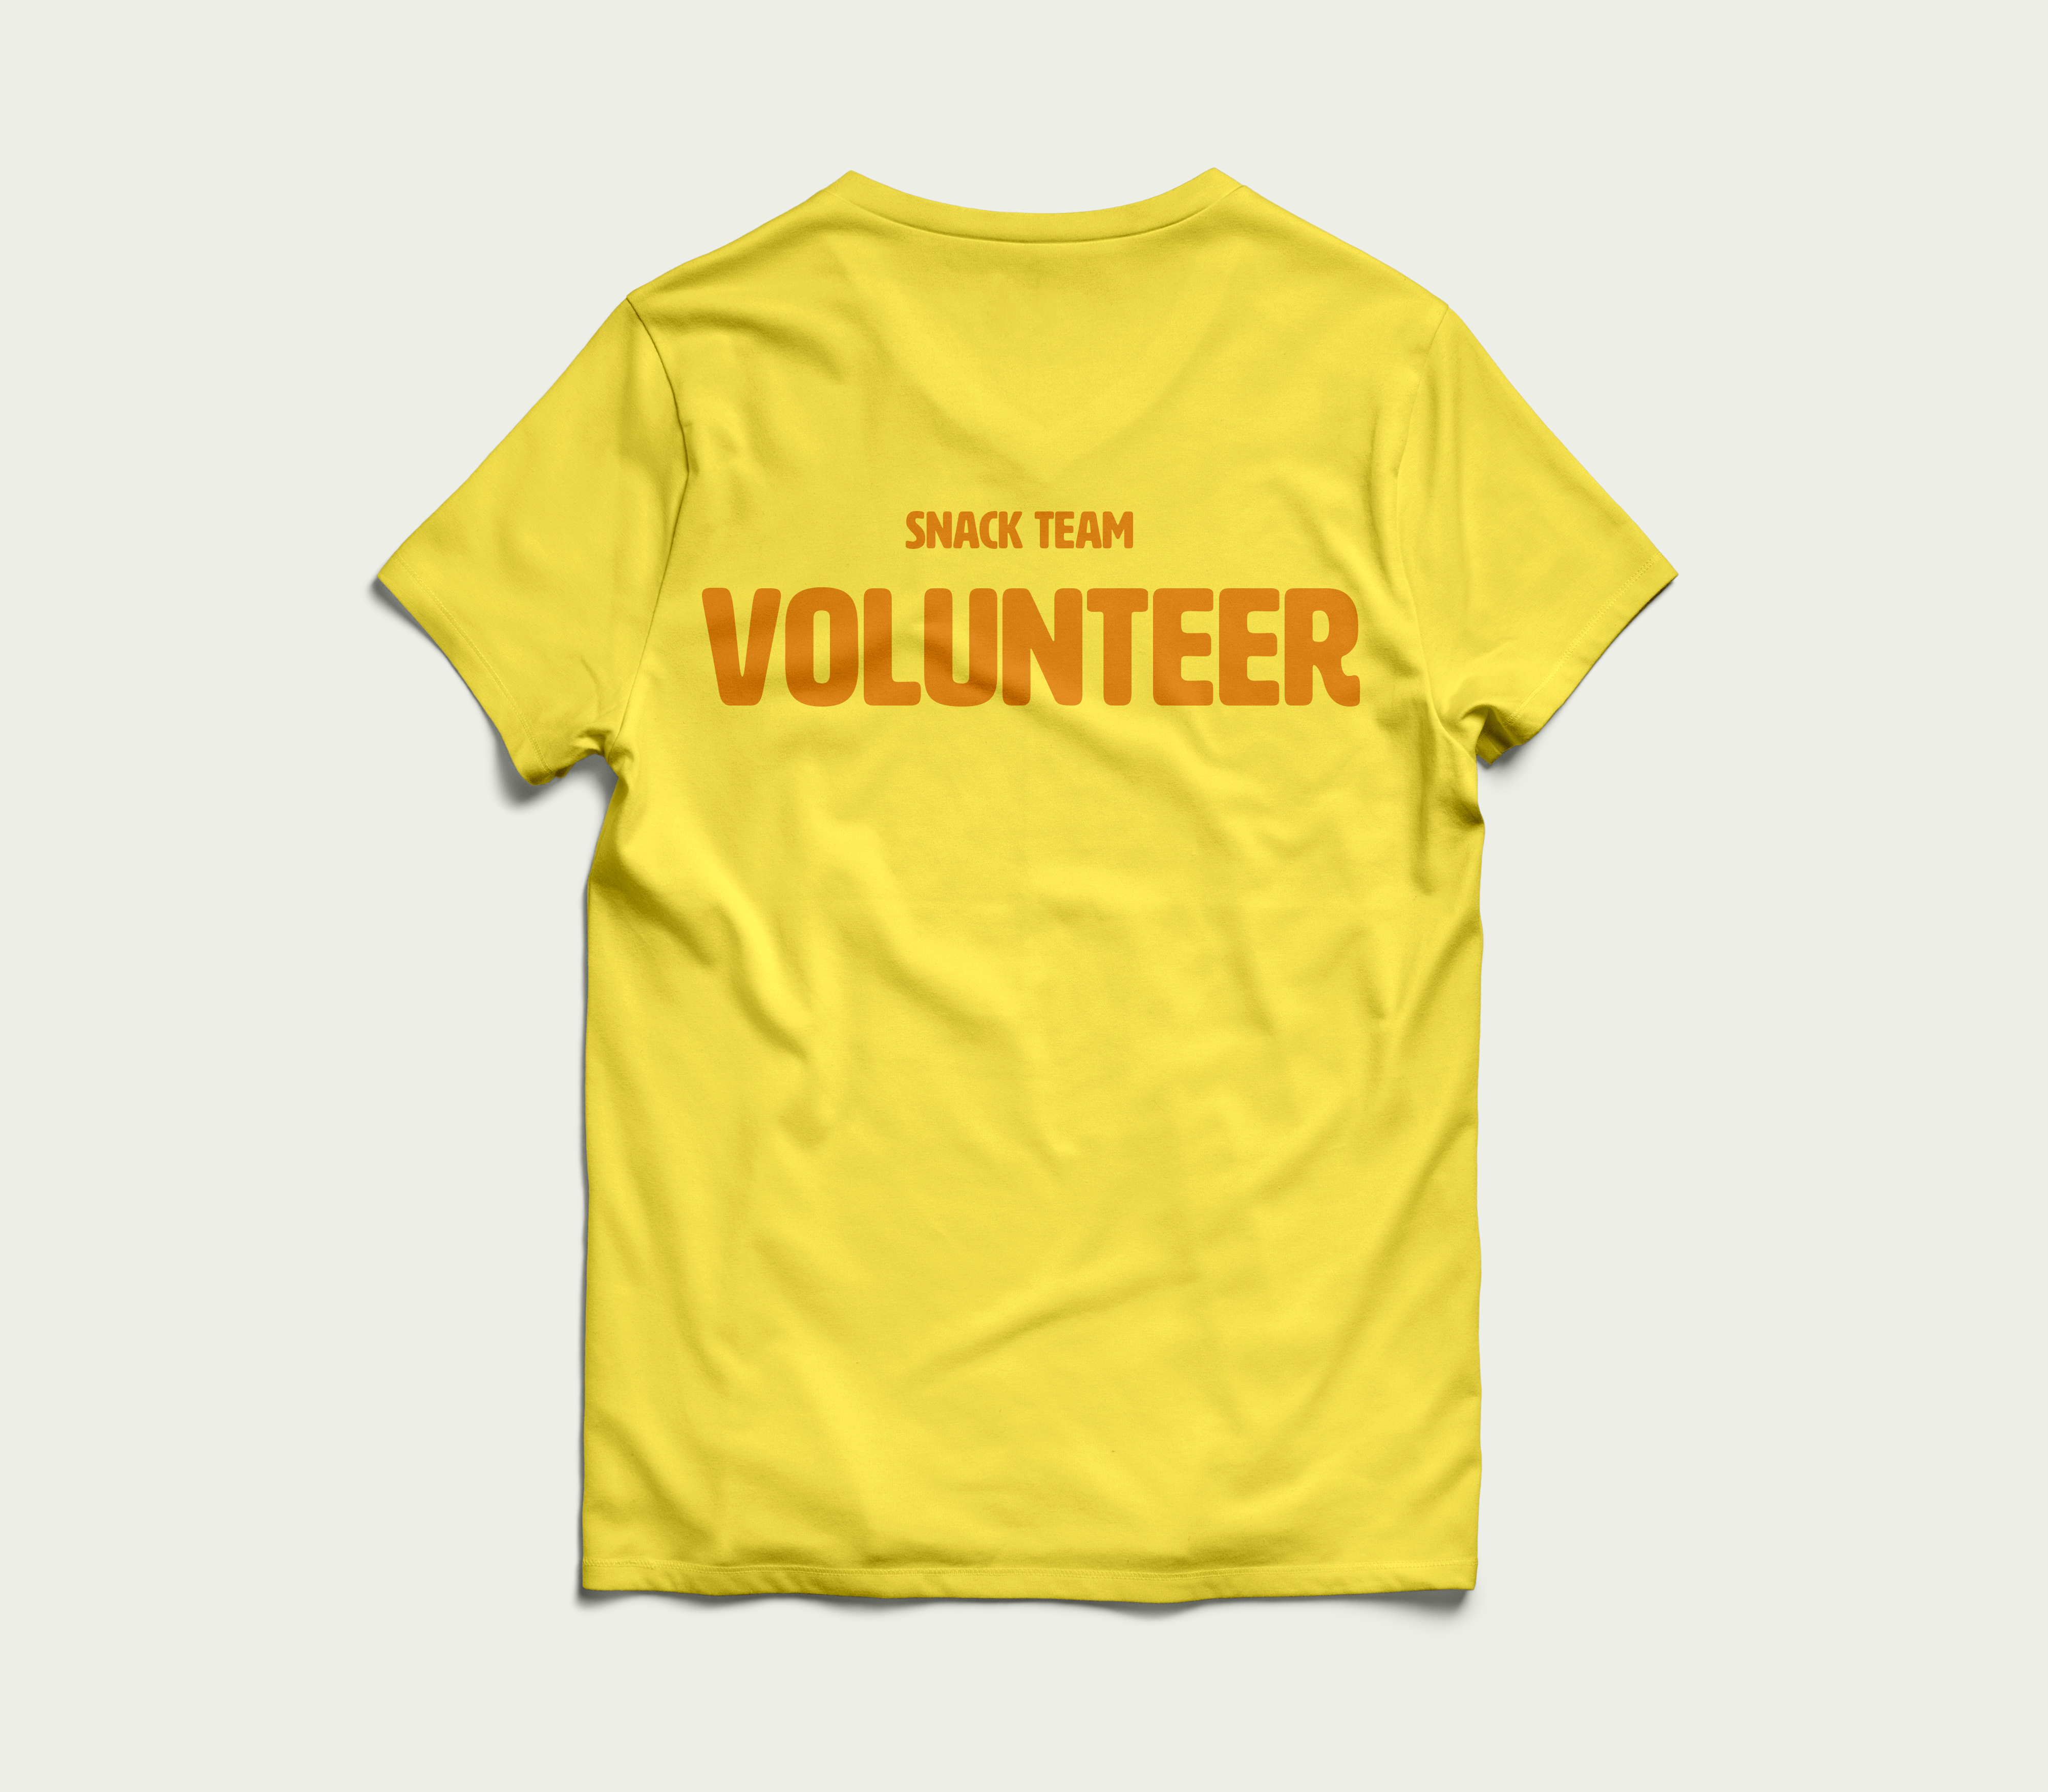 snack volunteer shirt back